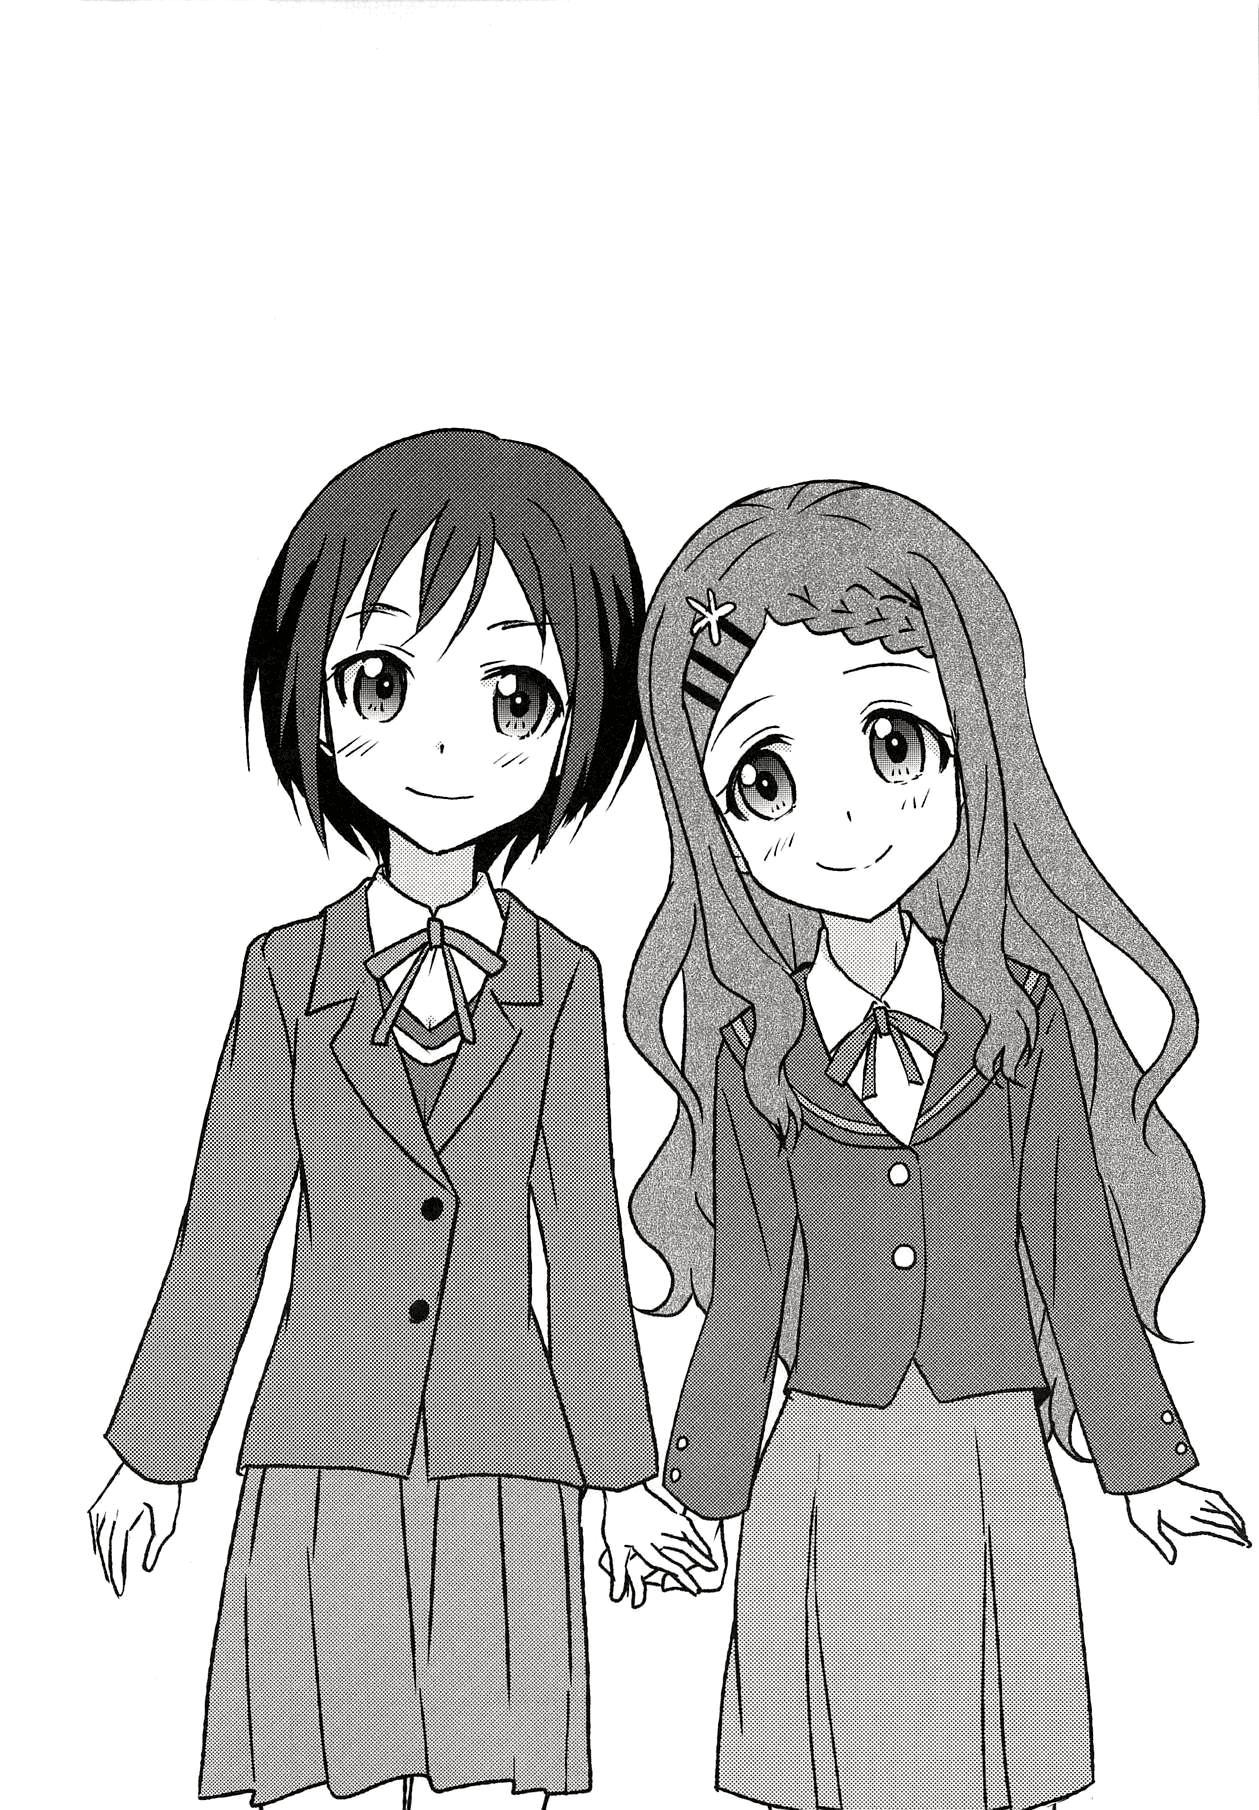 Yuri Ecchi nante Hisashiburi desu~ | It's Been a While Since We've Had Yuri Sex 16